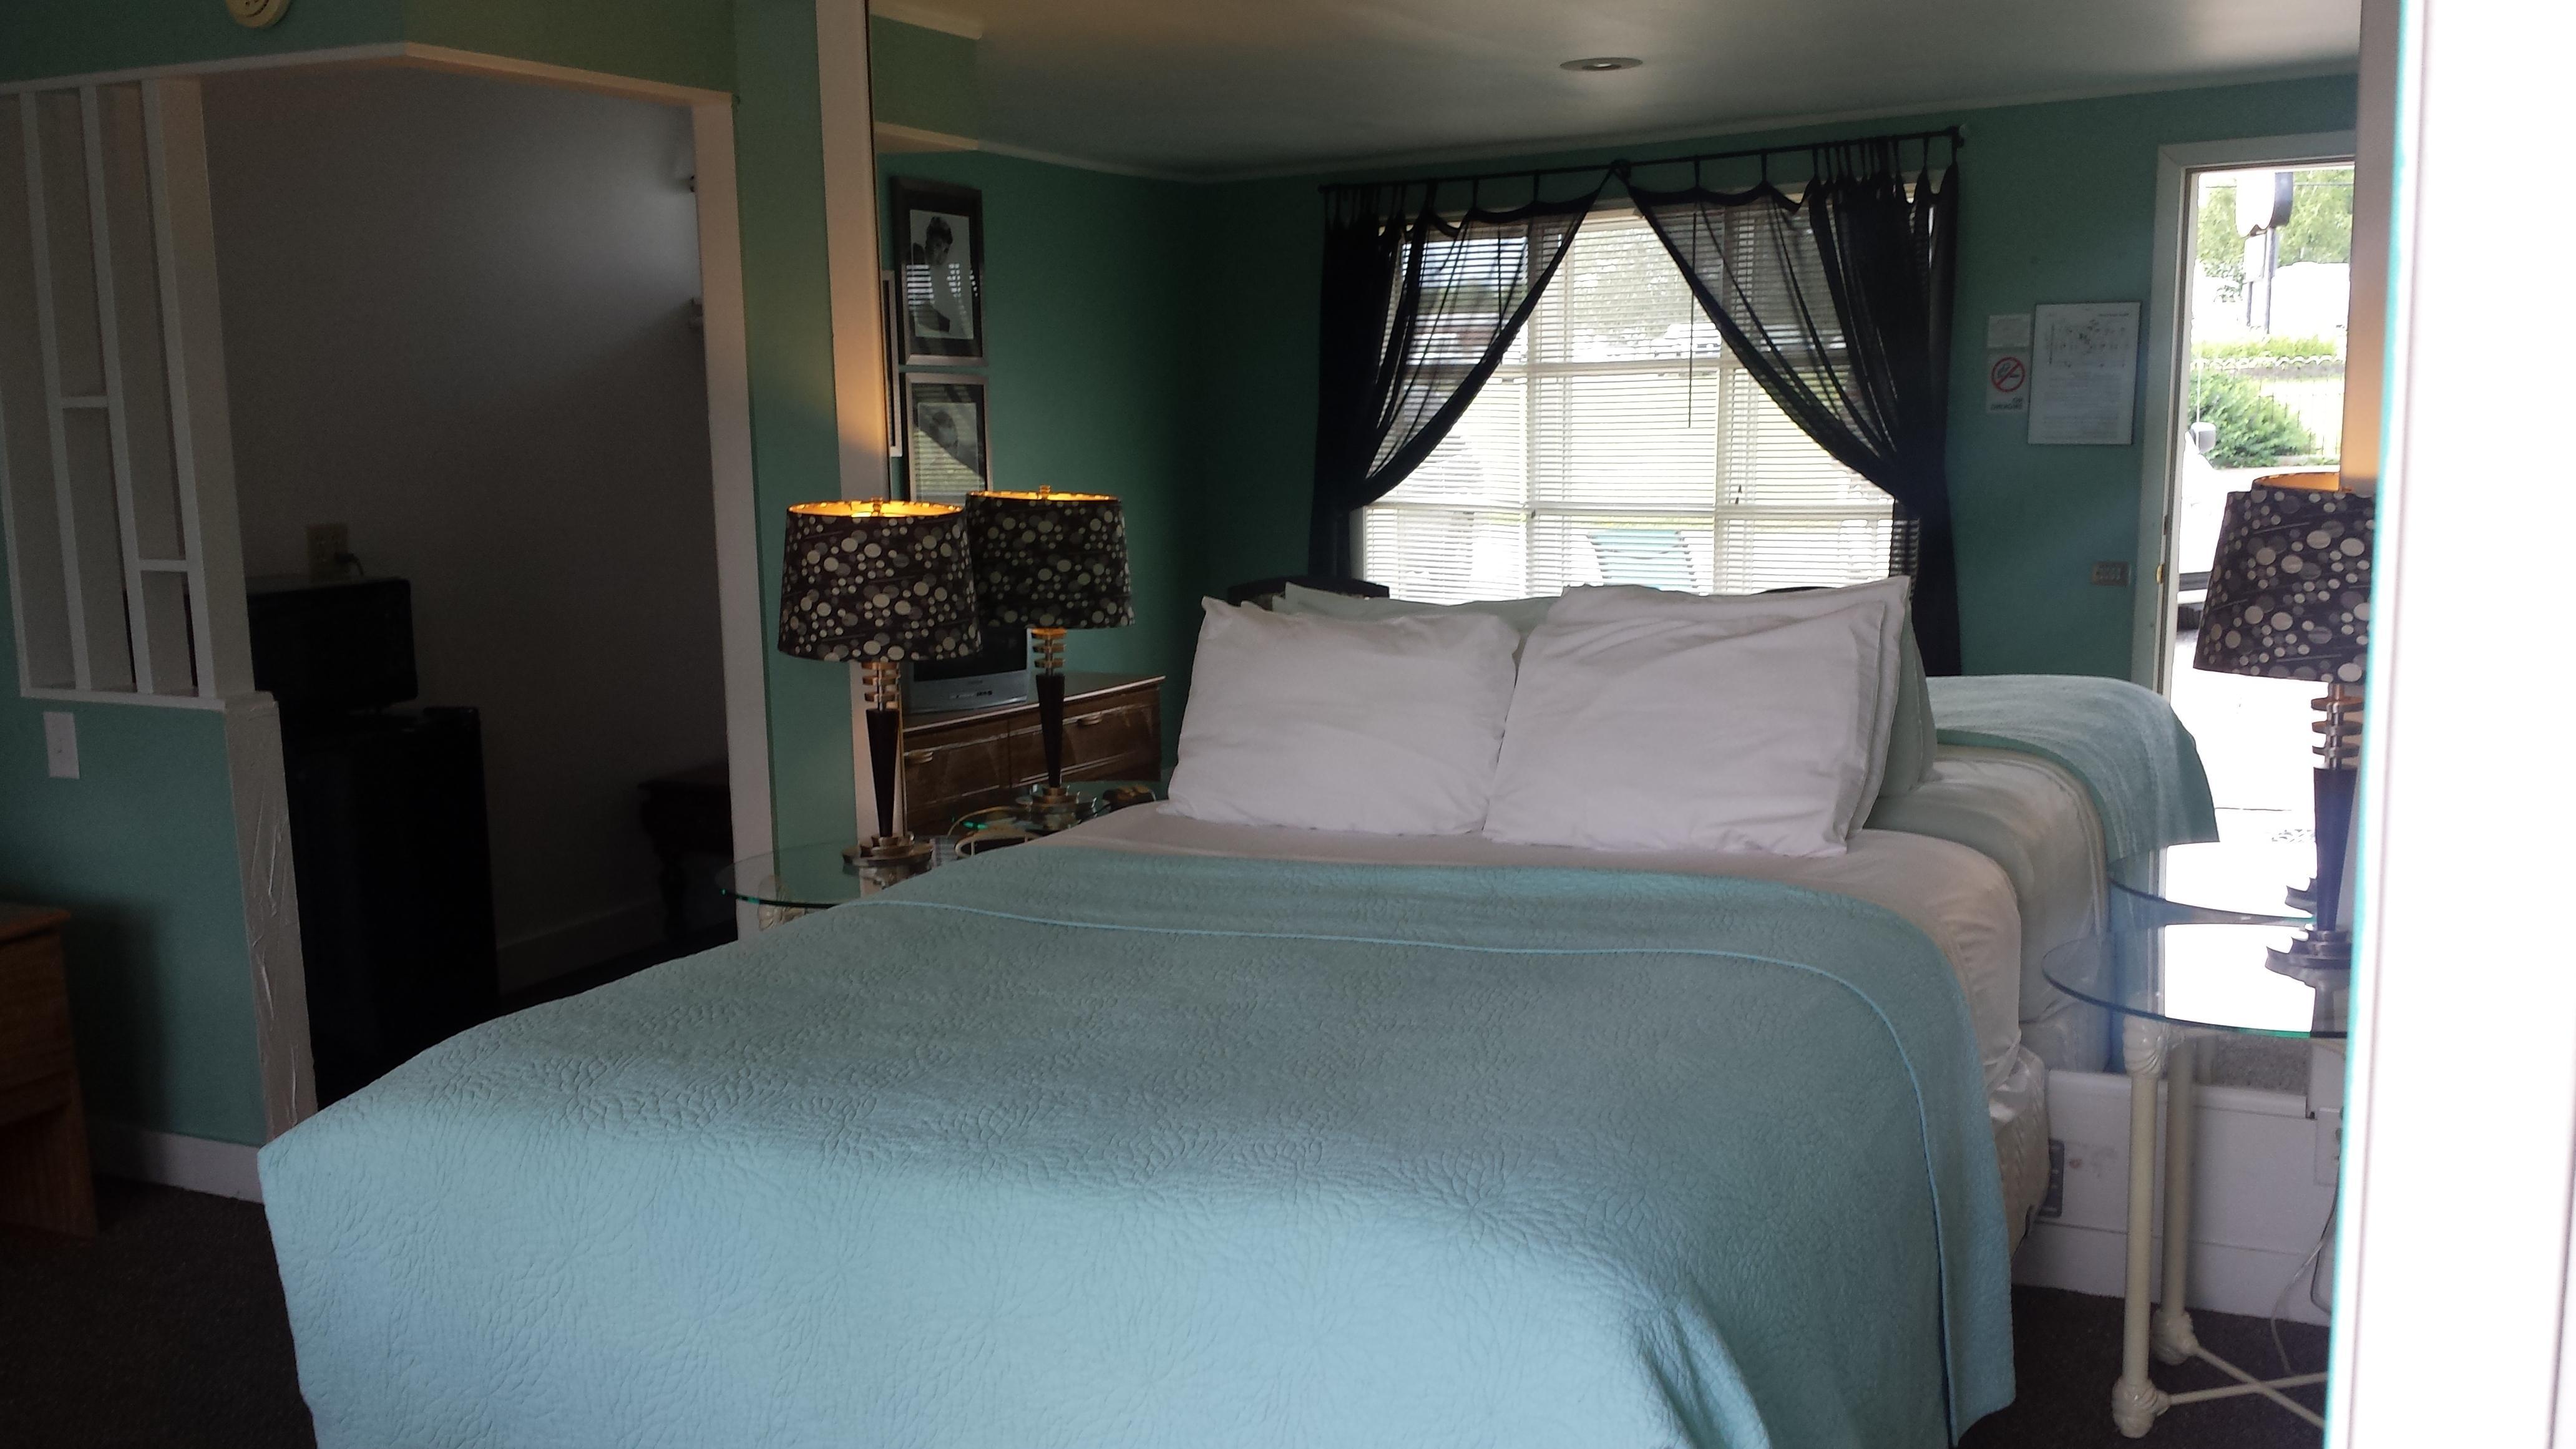 Miami Resort Motel